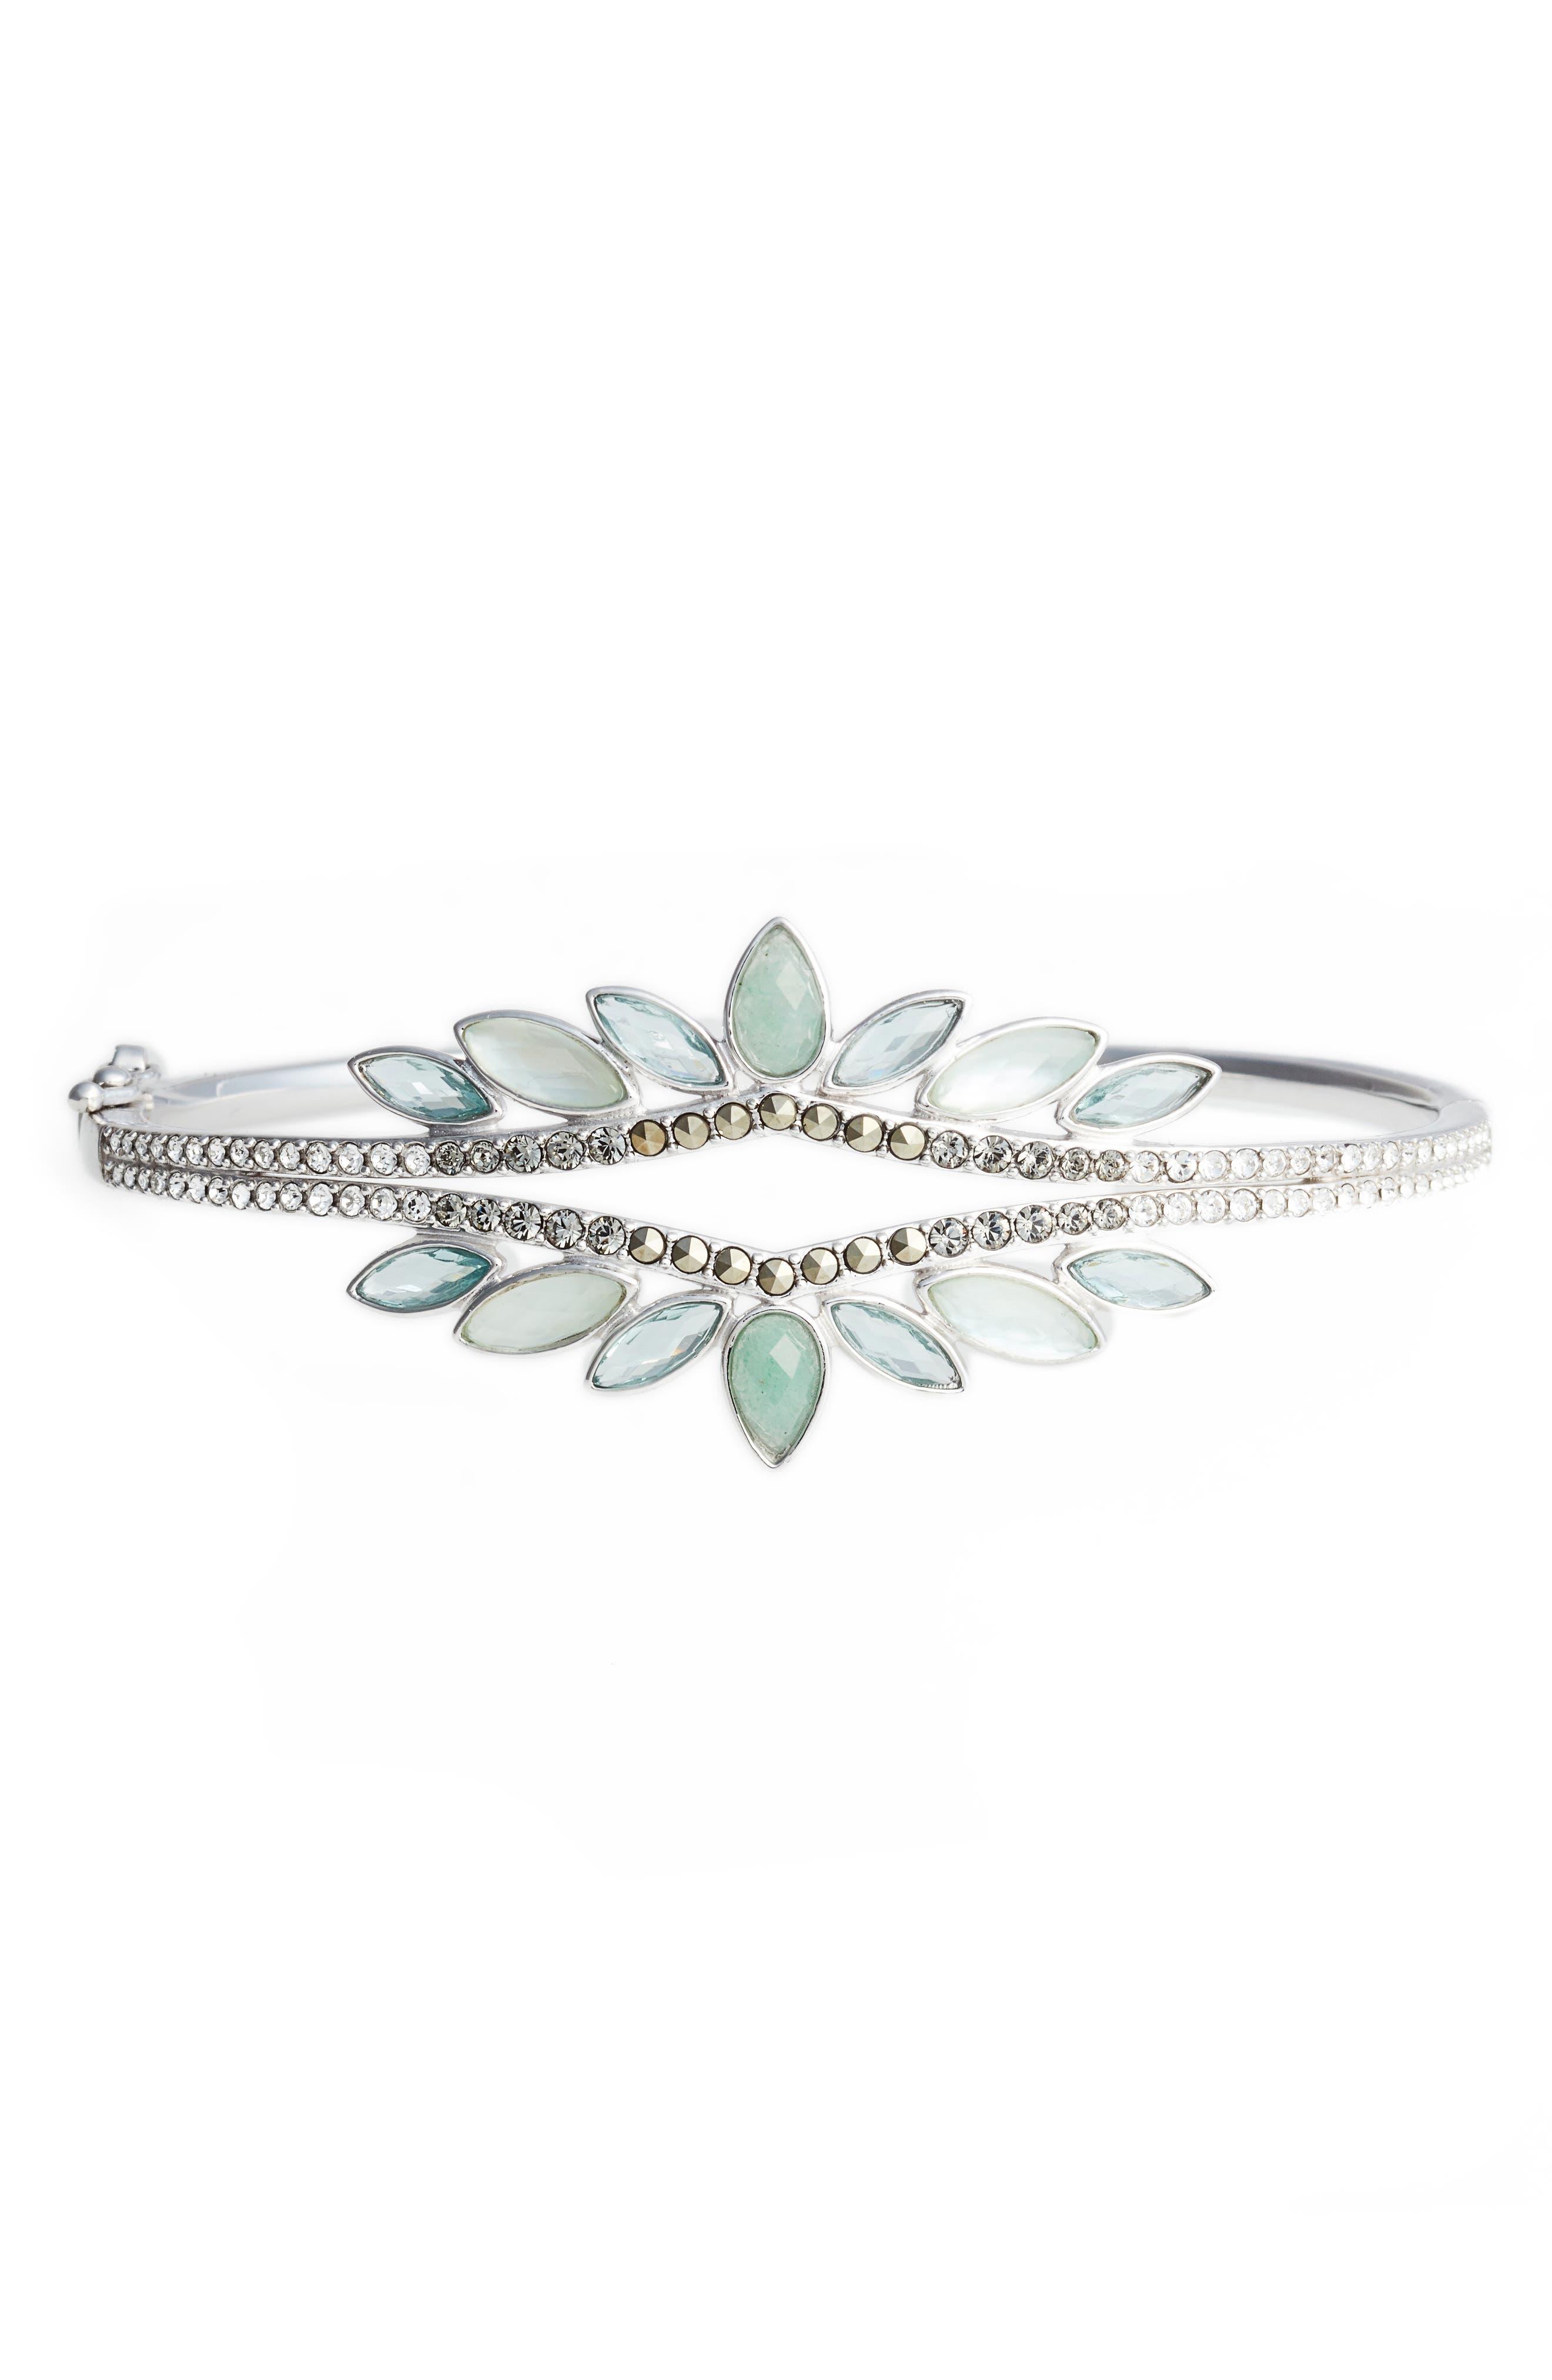 Main Image - Judith Jack Lakeside Openwork Crystal Bracelet